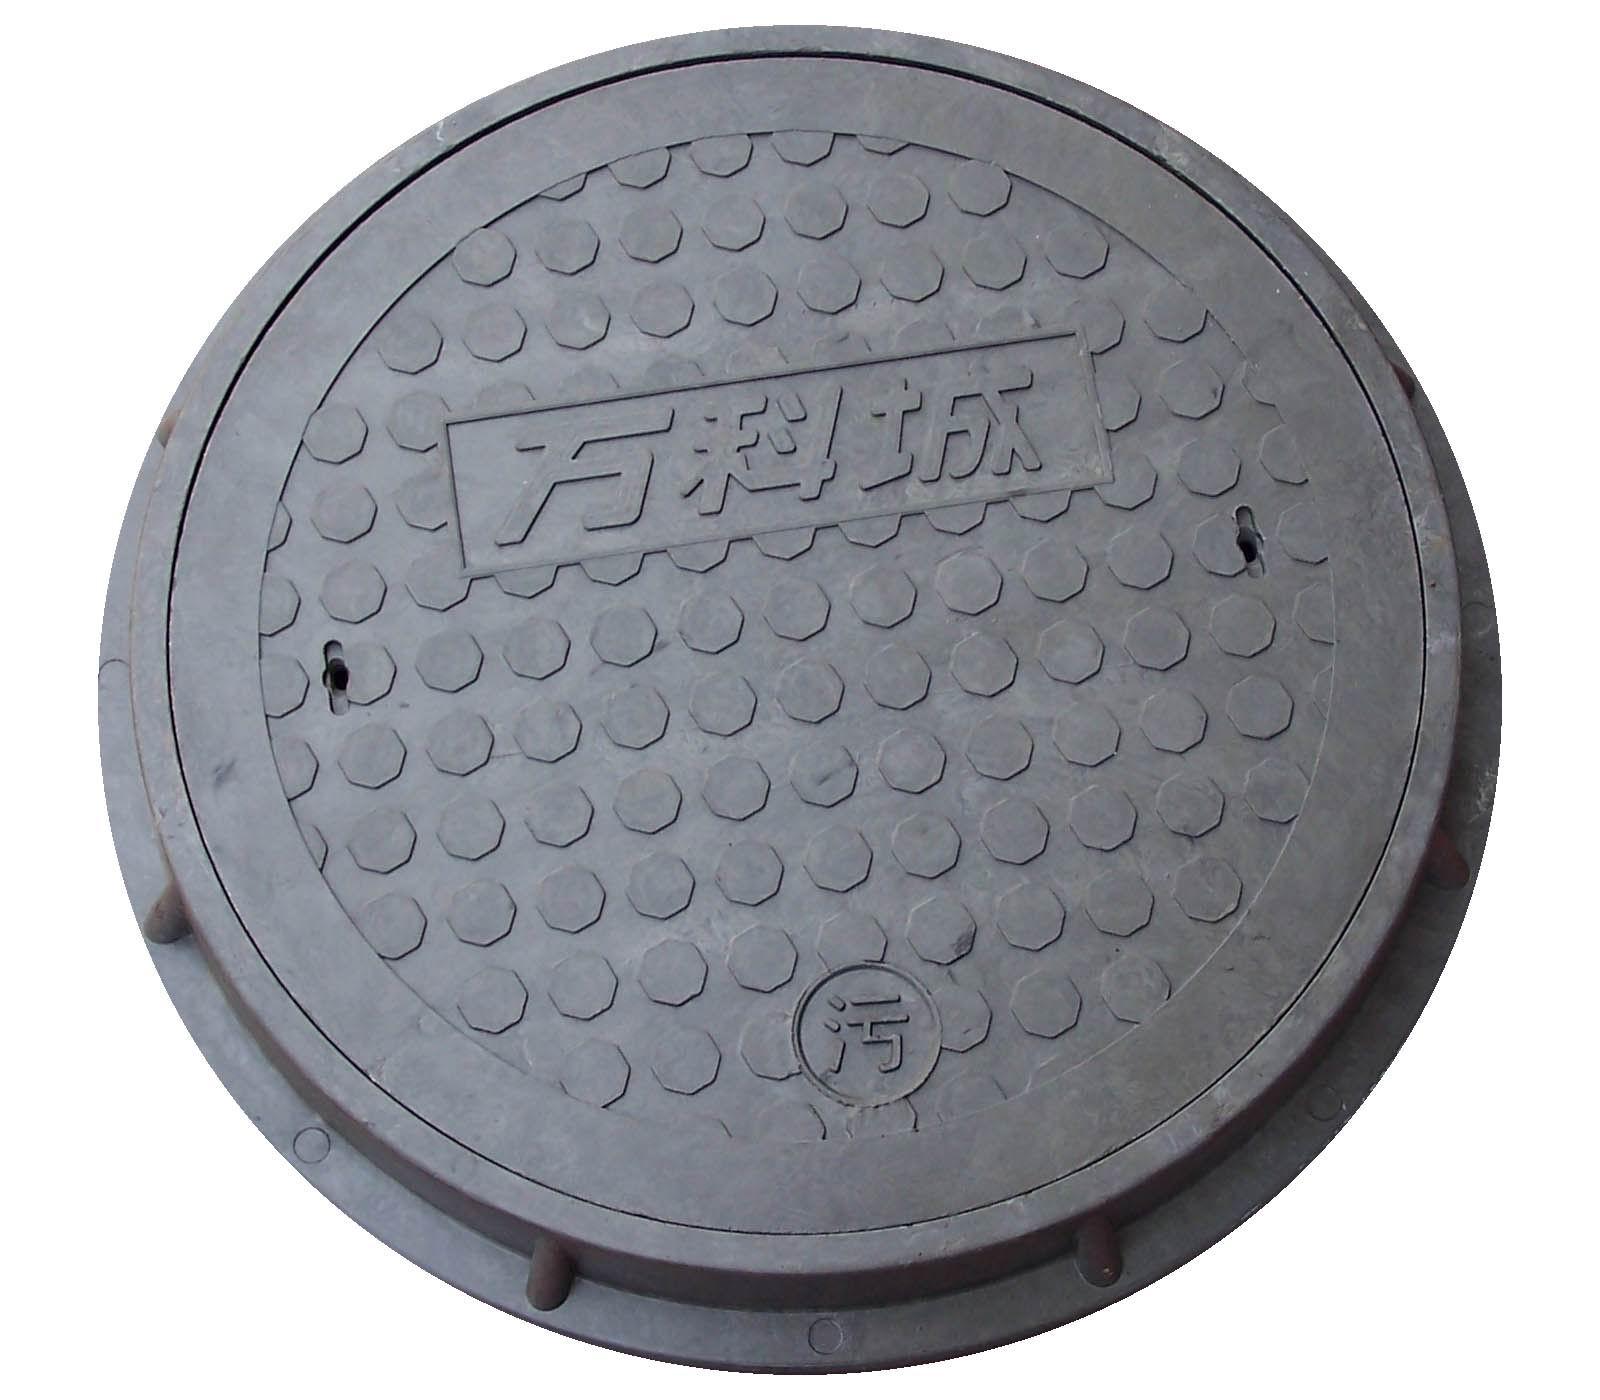 70050mm smc bmc composite square manhole cover with CE certification